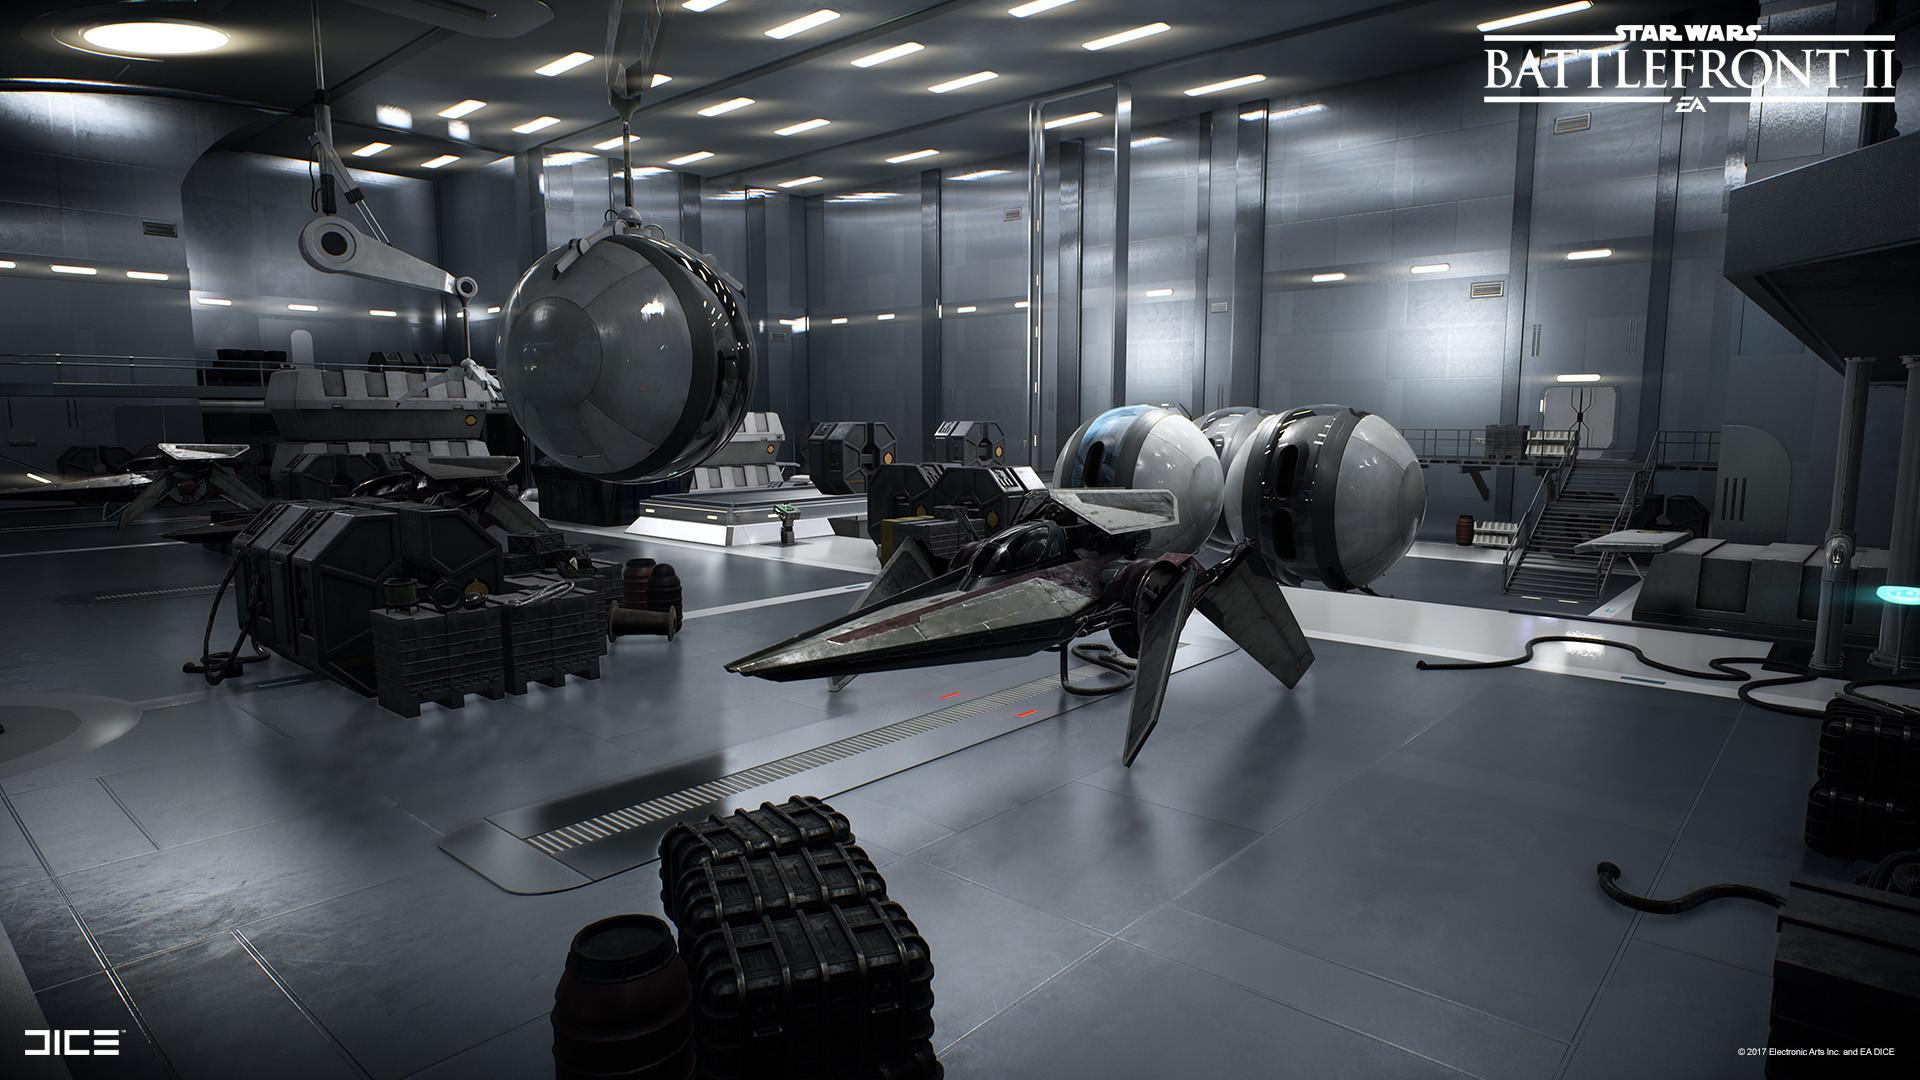 Michael Anderson Star Wars Battlefront Ii